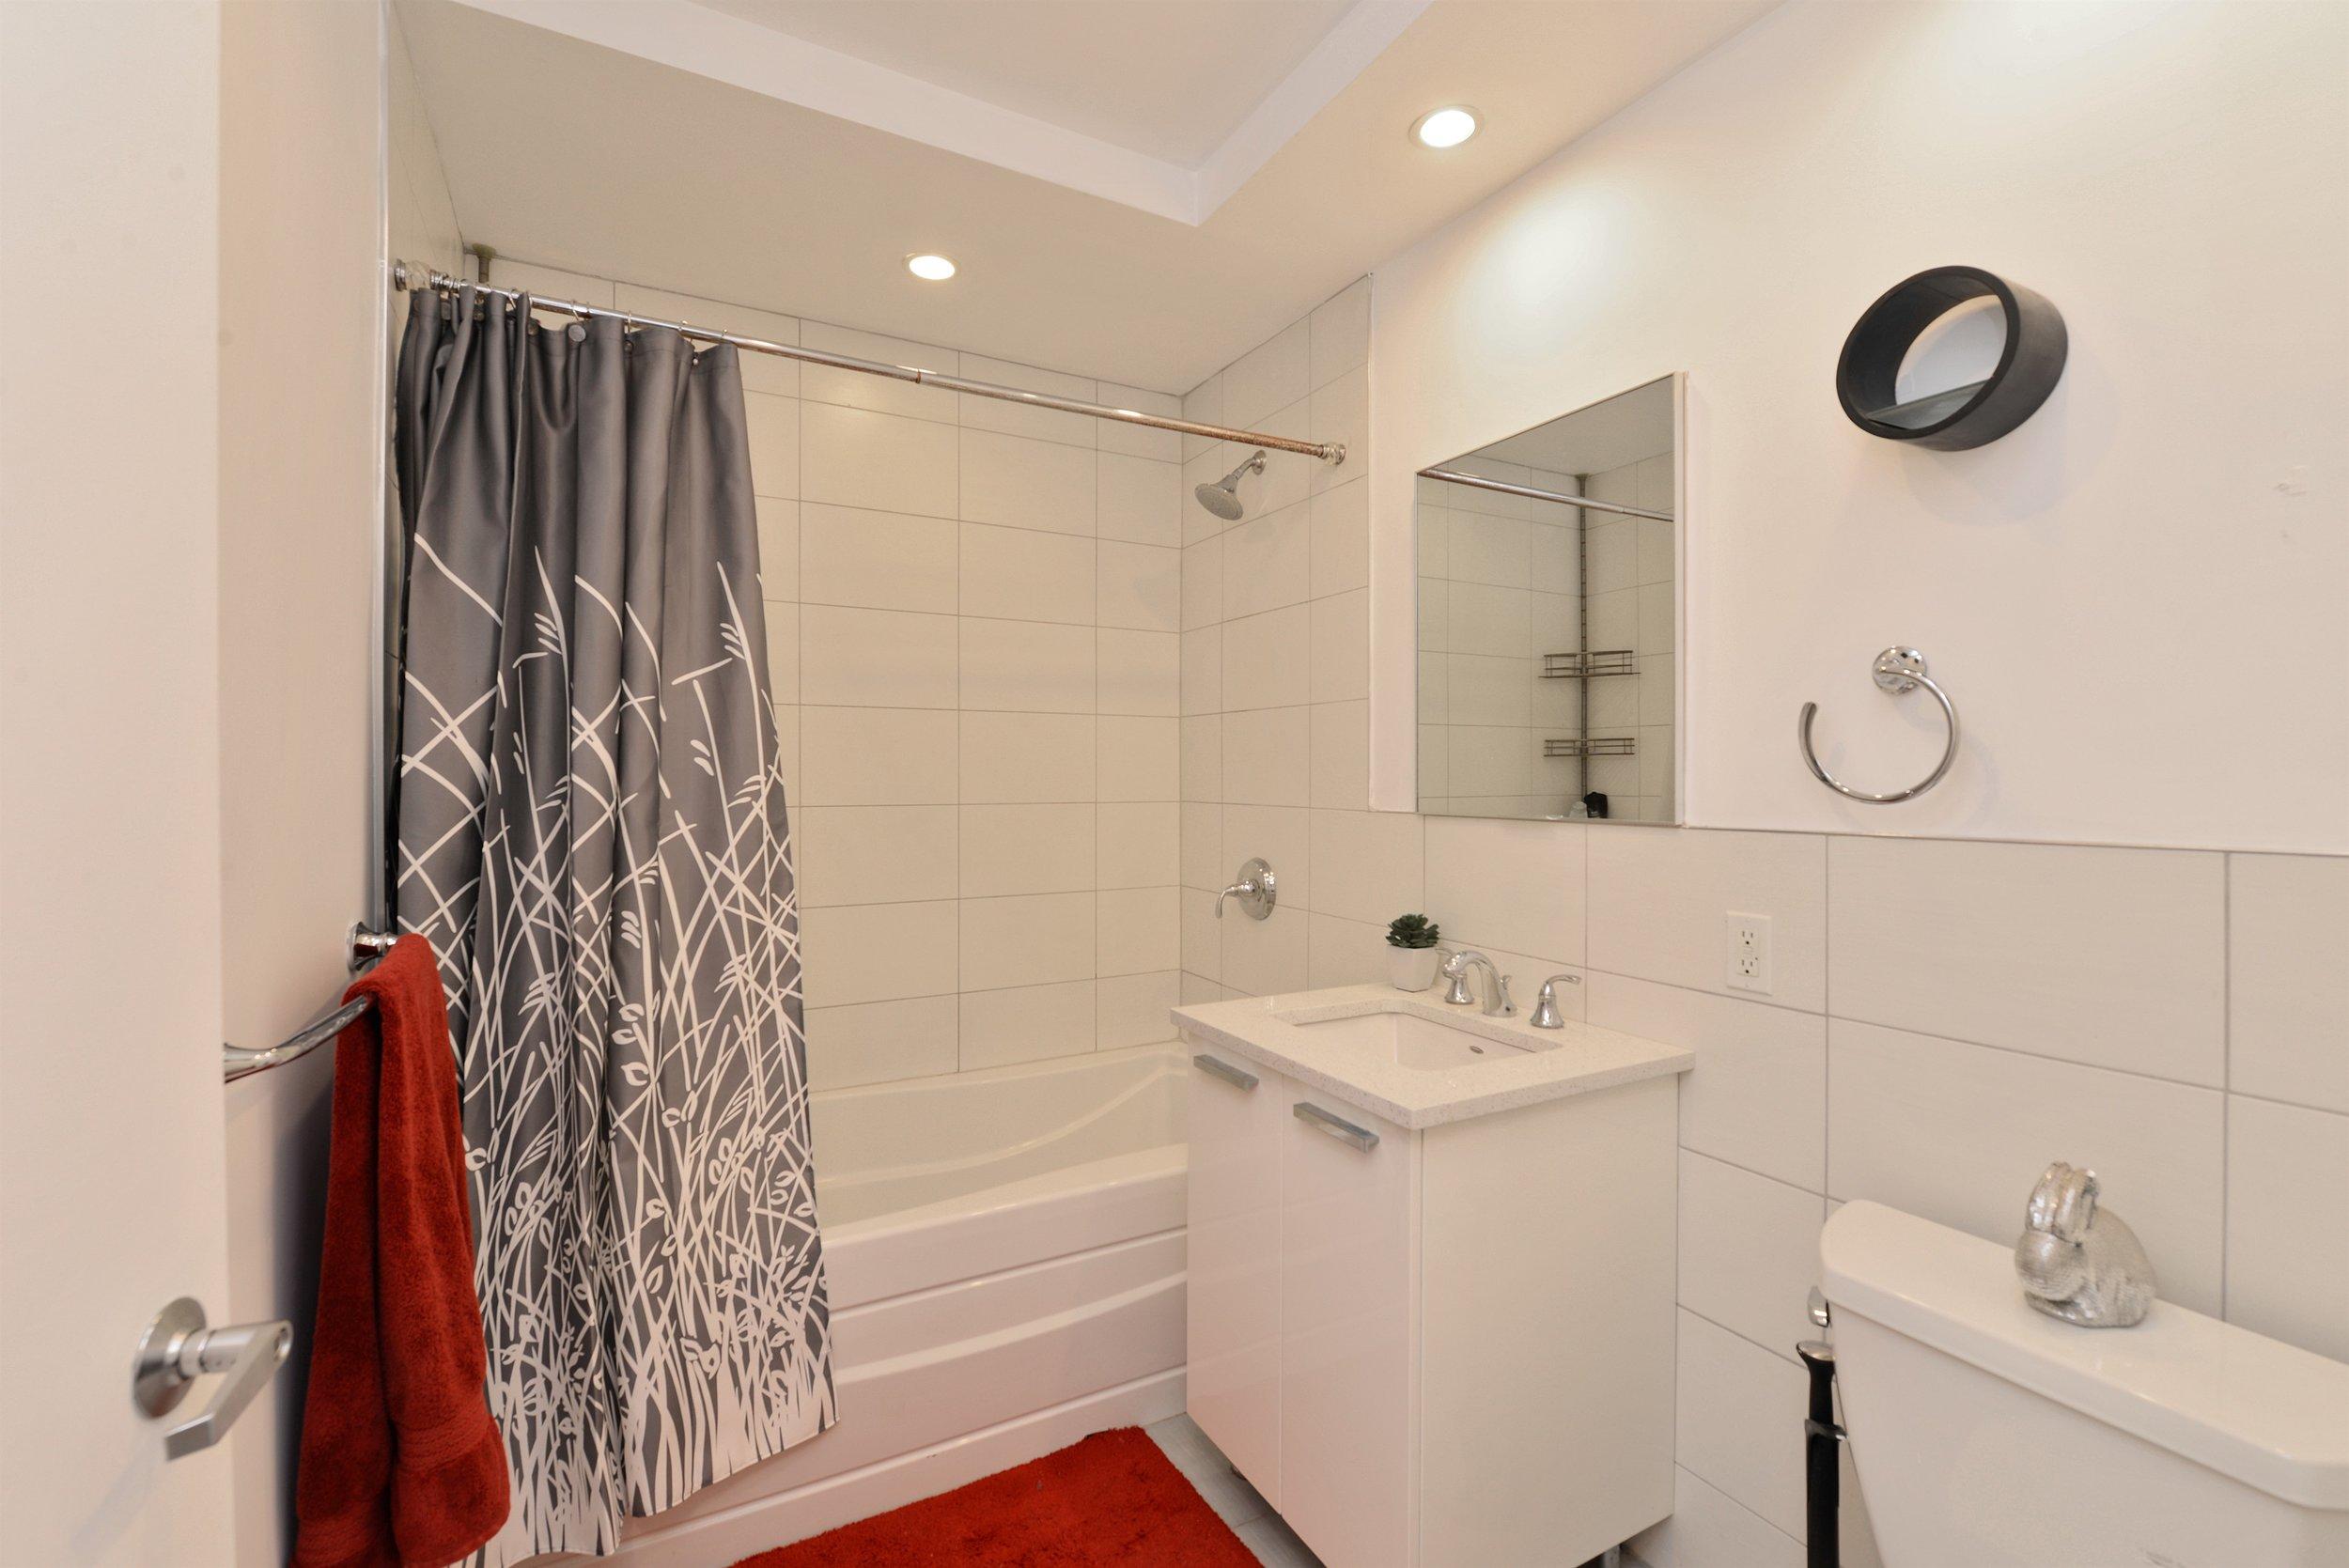 317 E 111 - Bathroom.jpg